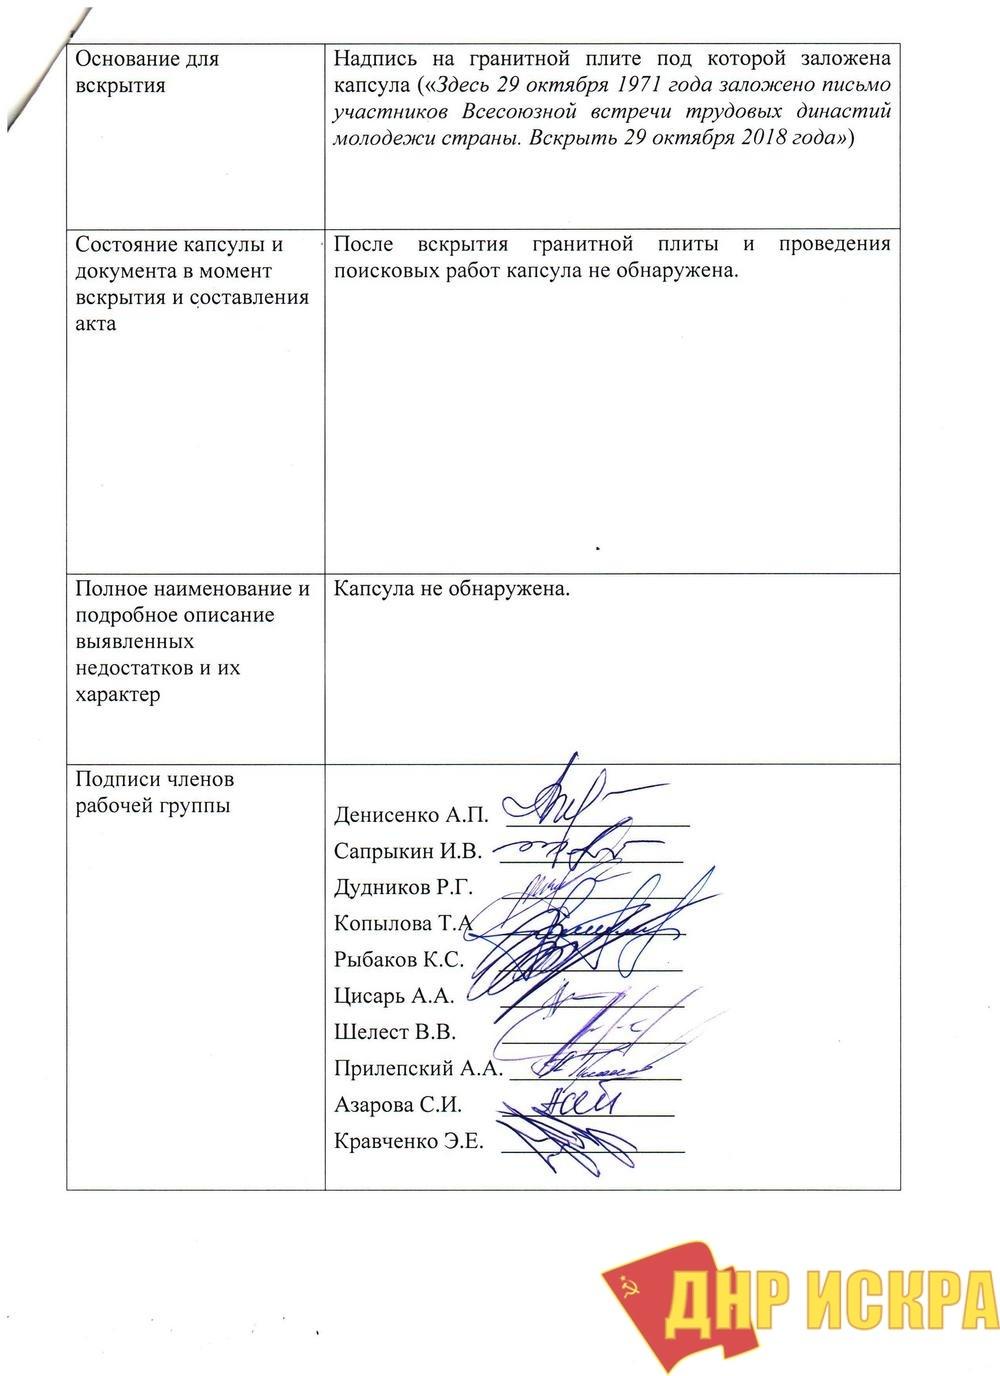 «Капсула времени» в Донецке не обнаружена (видео)